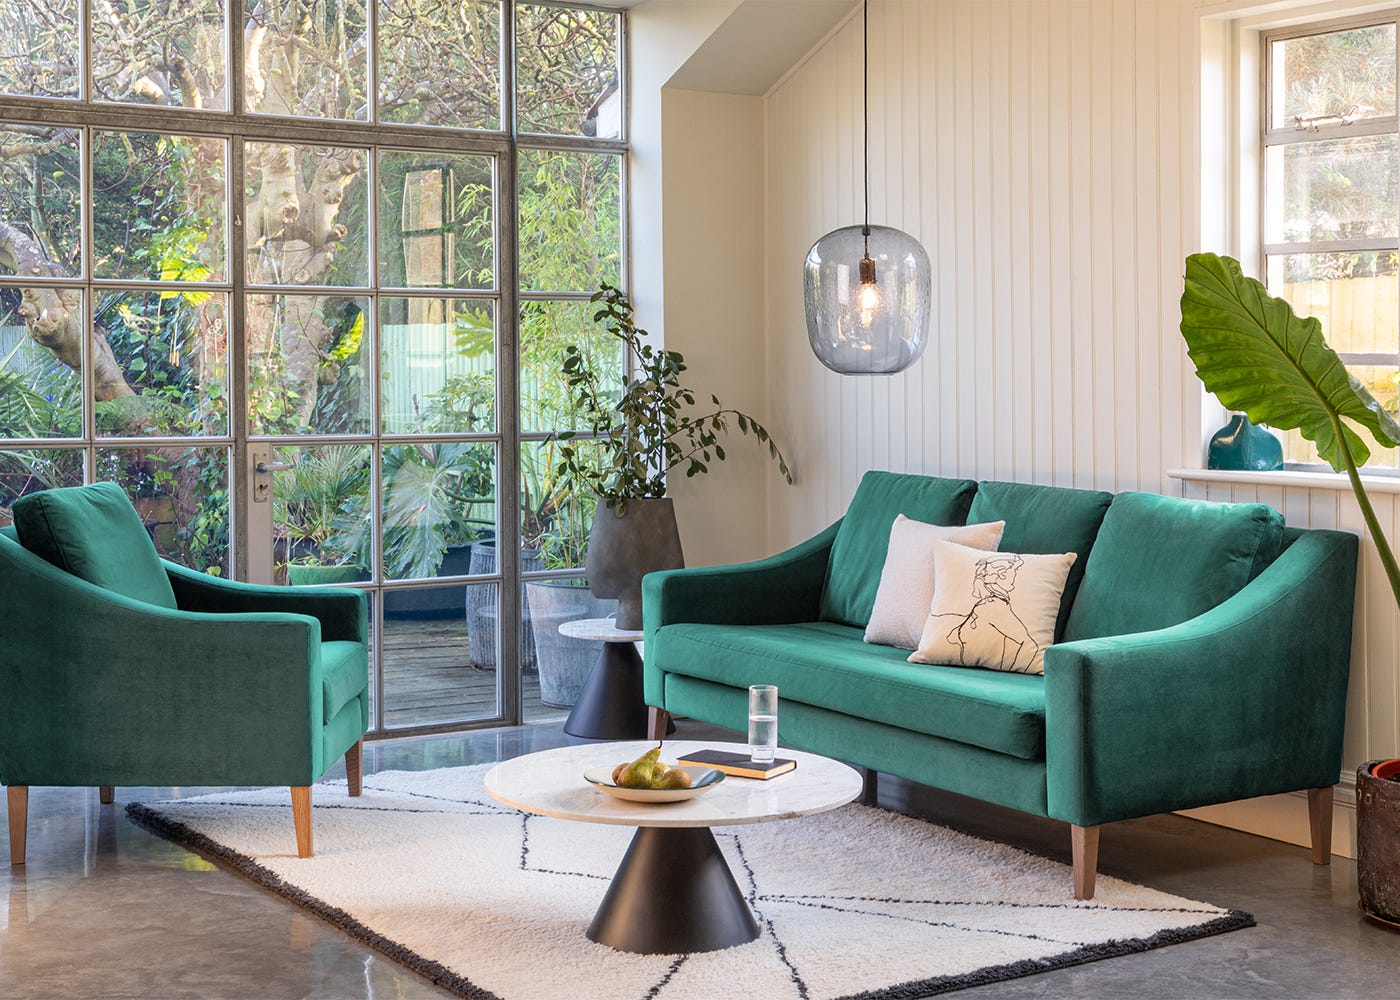 Richmond 3 Seater Sofa and Armchair in Smart Velvet Sea Foam